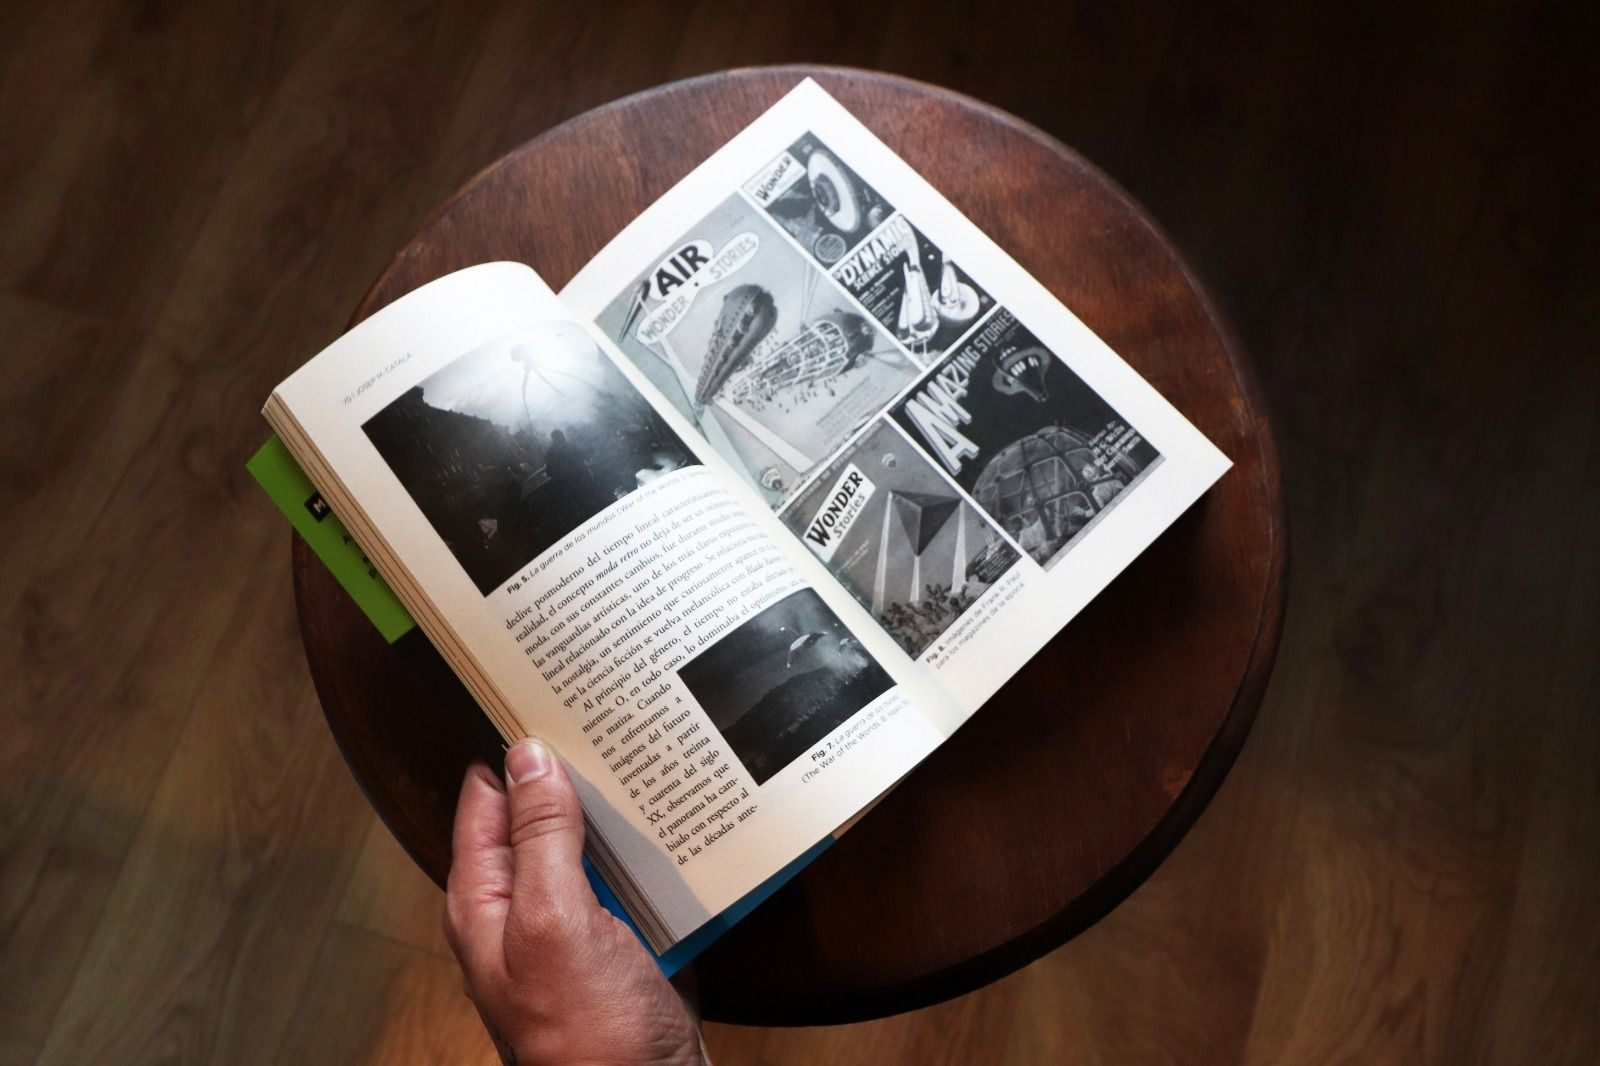 Imaginar Mundos – Sans Soleil Ediciones 2019-05-14 at 19.45.44 (22)